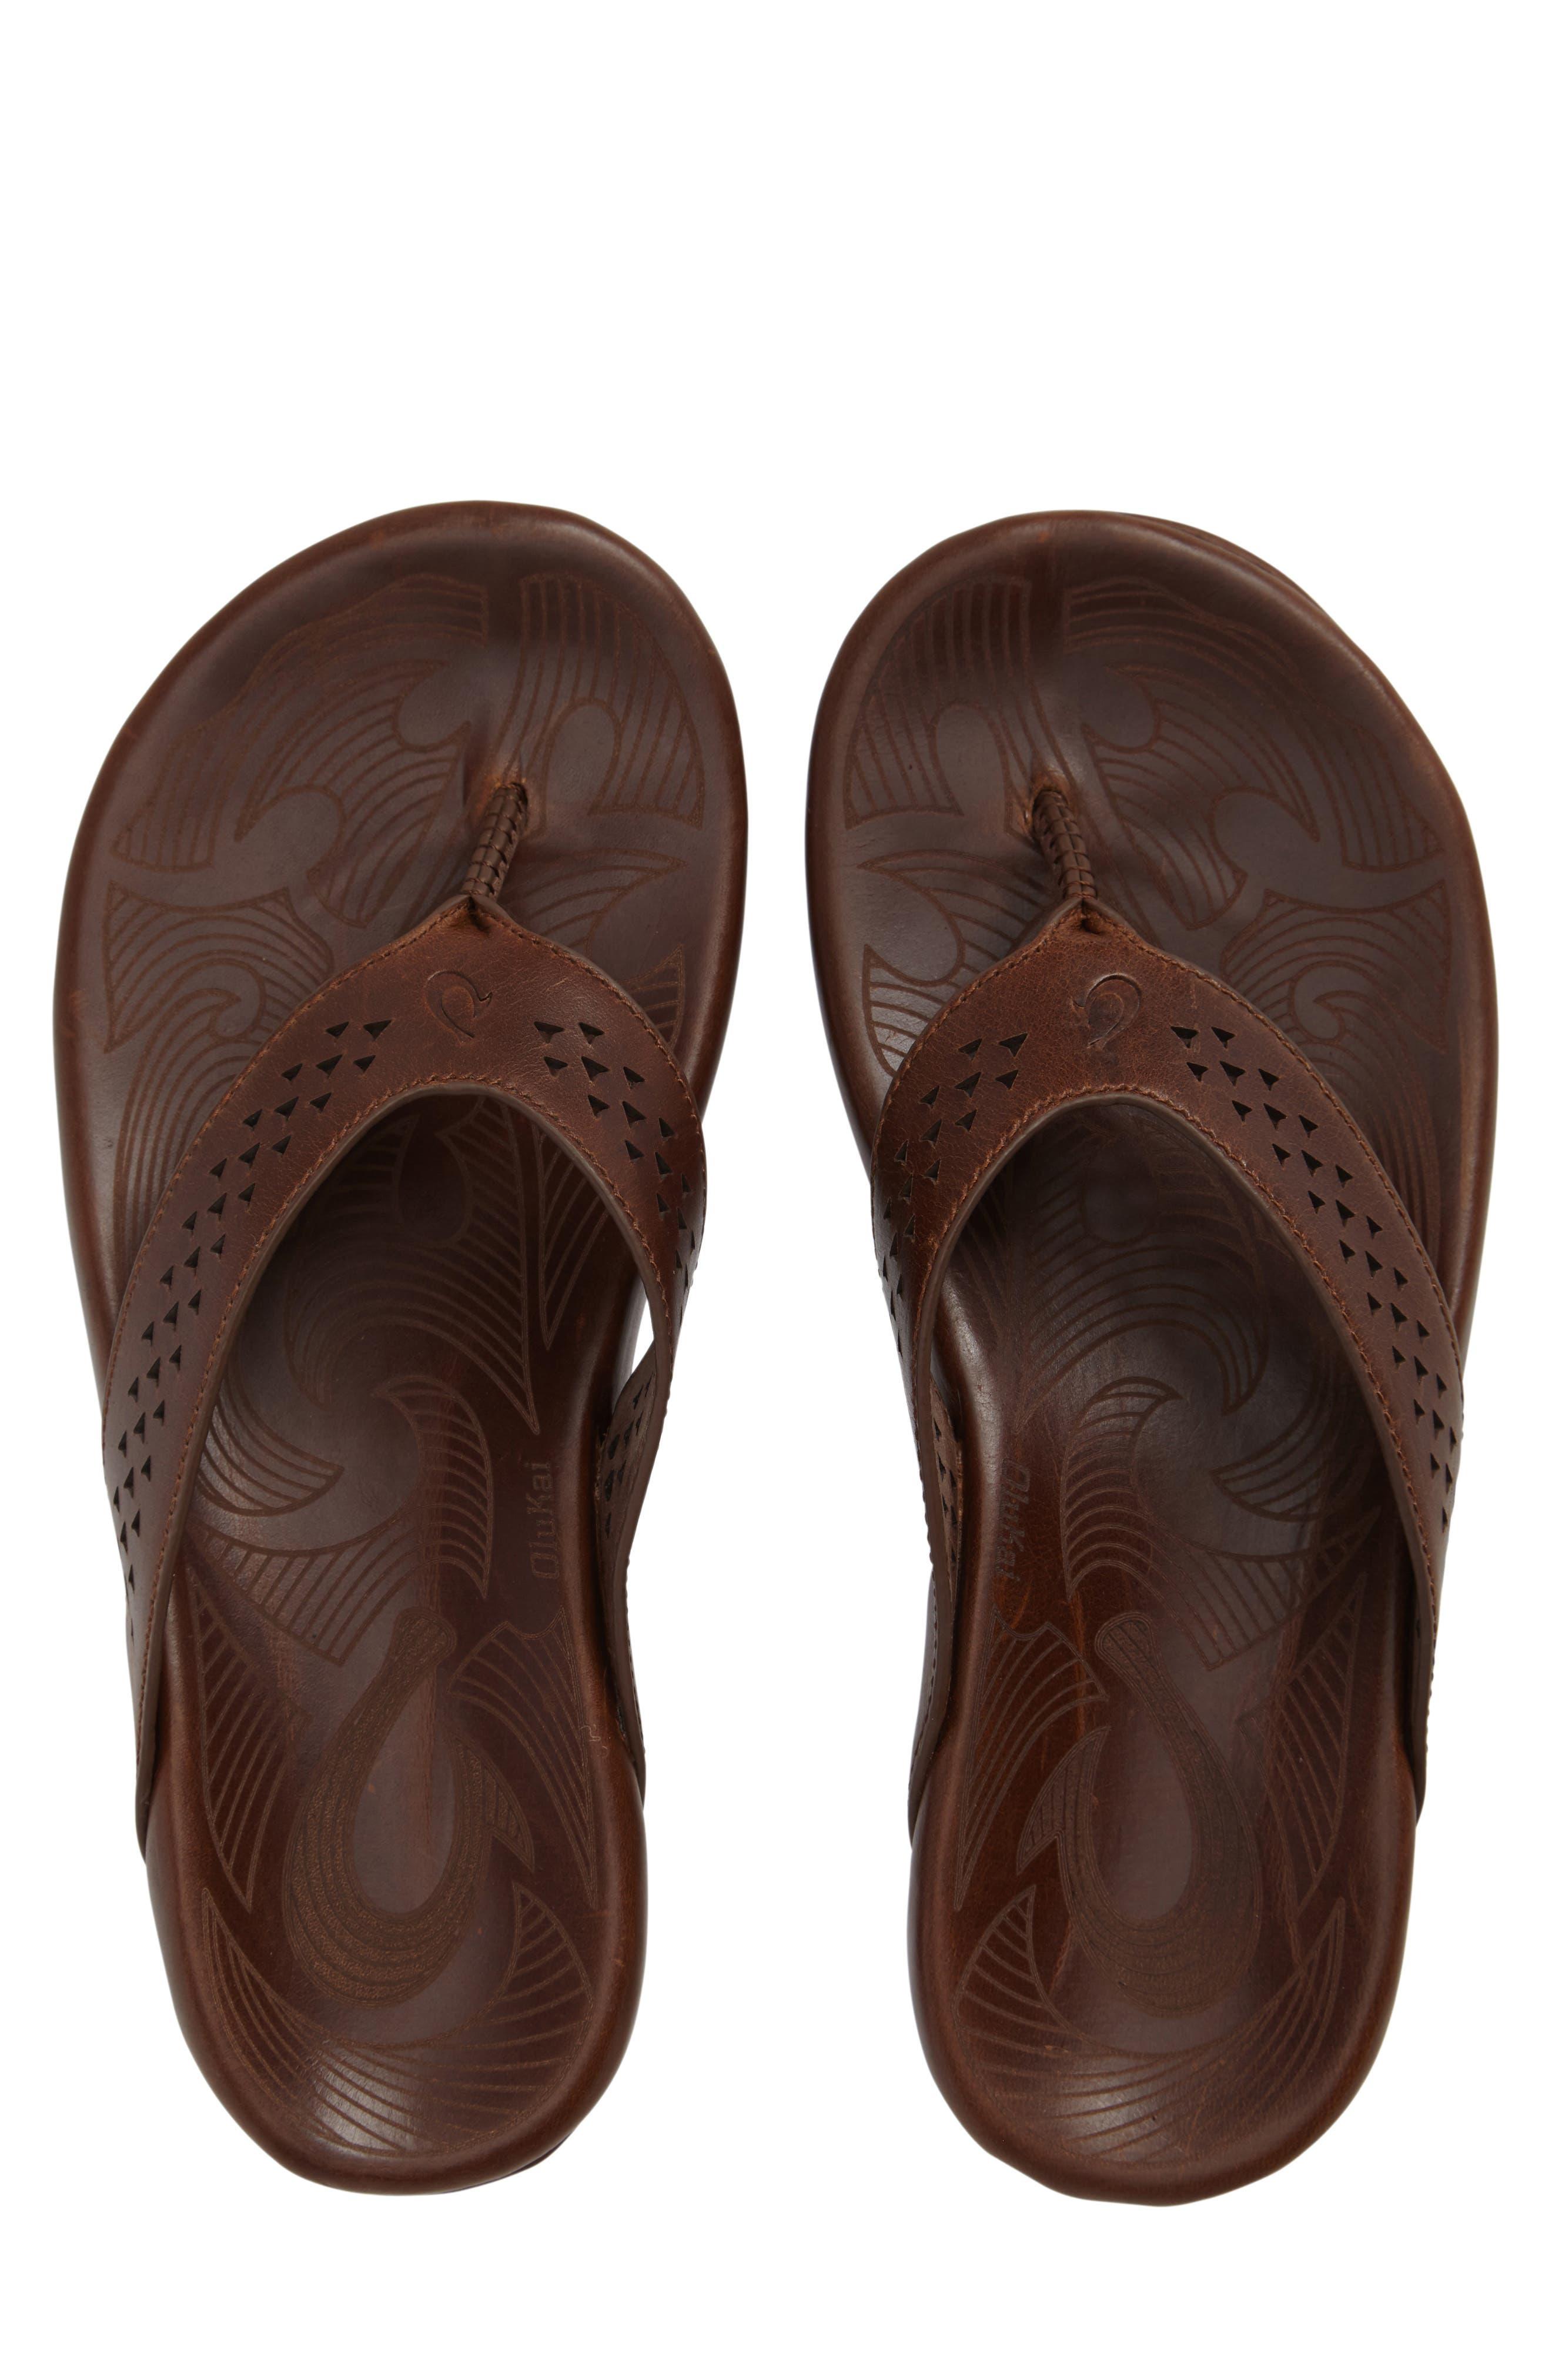 Alternate Image 1 Selected - OluKai Kohana Flip Flop (Men)